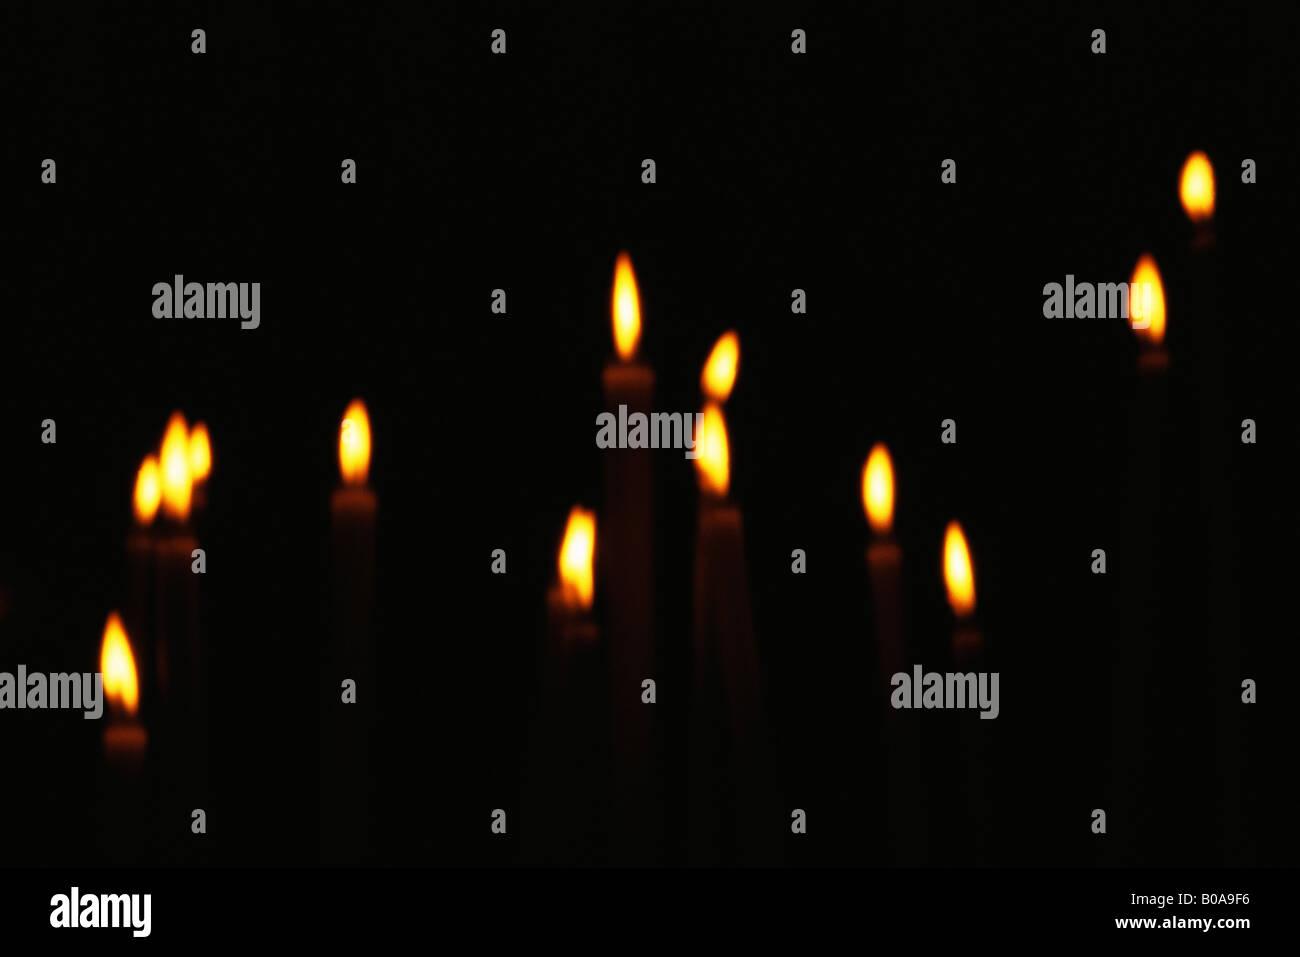 Several candles burning in the dark, full frame - Stock Image